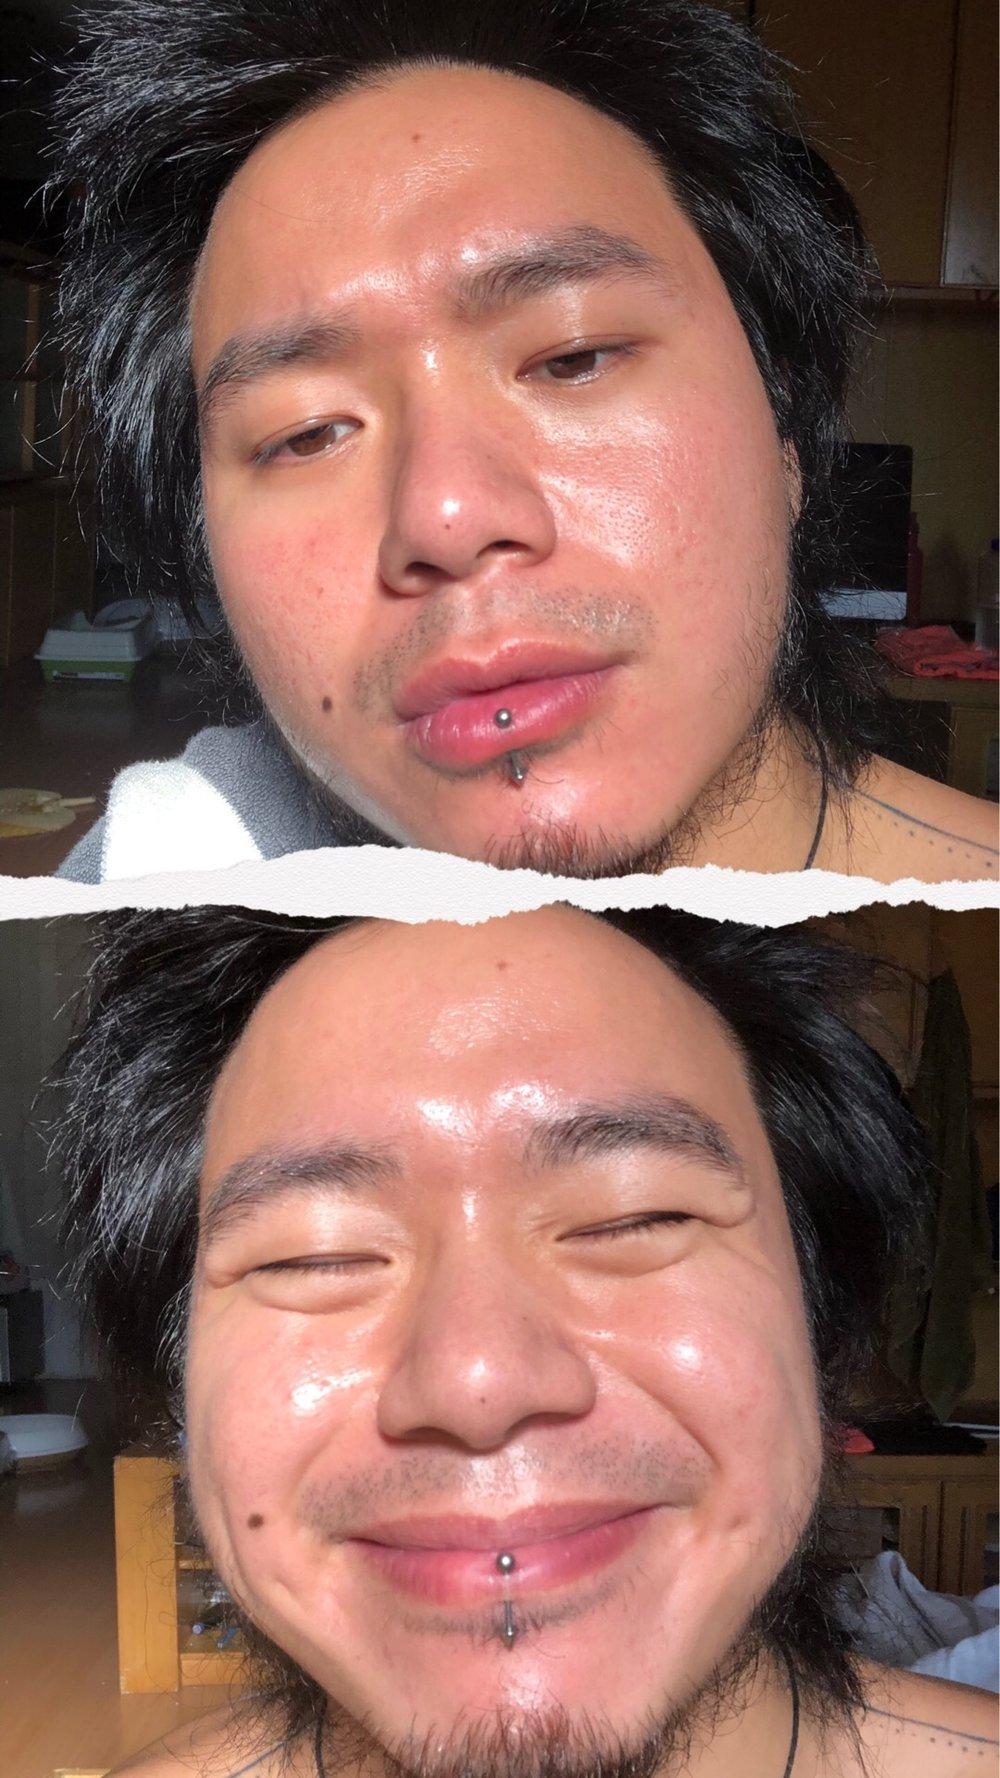 Liat yang atas, masih keliatan acne scar, dulu dalem banget - sekarang lumayan lah :D